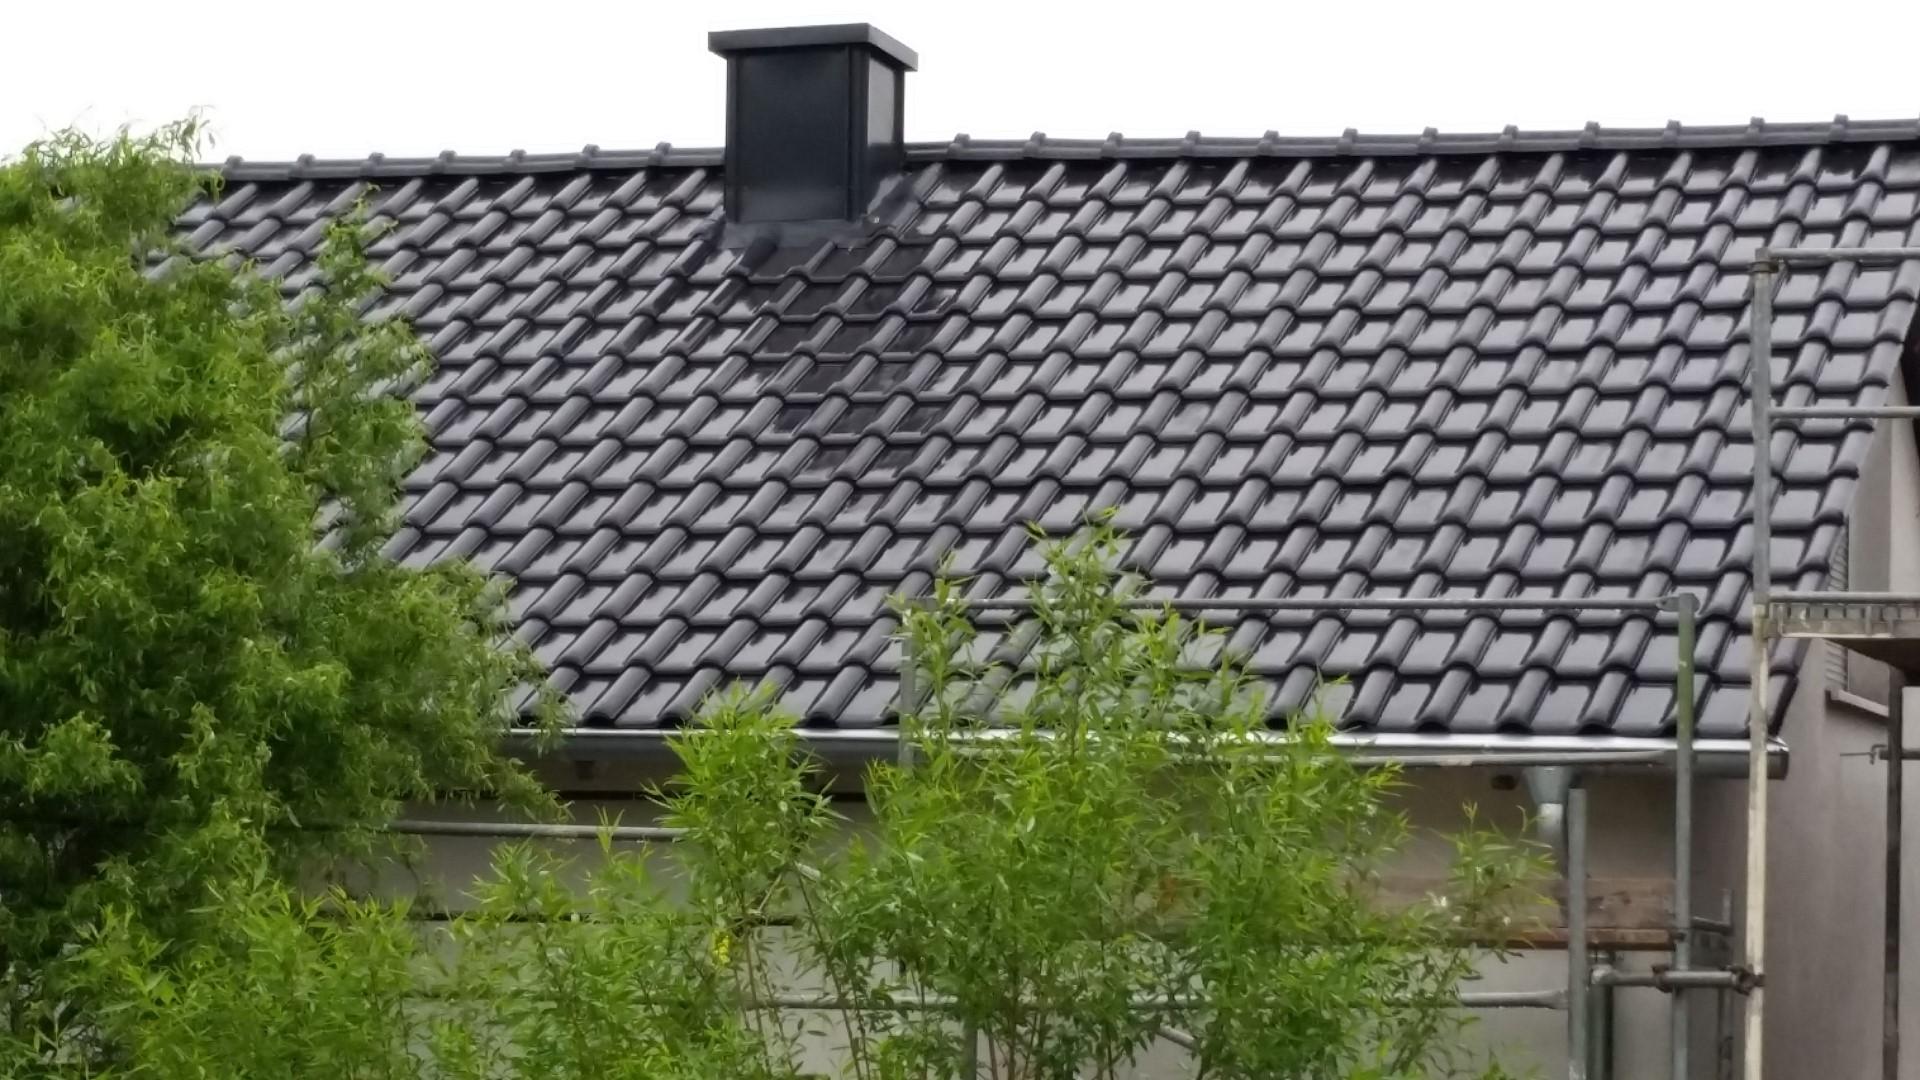 Dachsanierung-1-Flammersbach-1